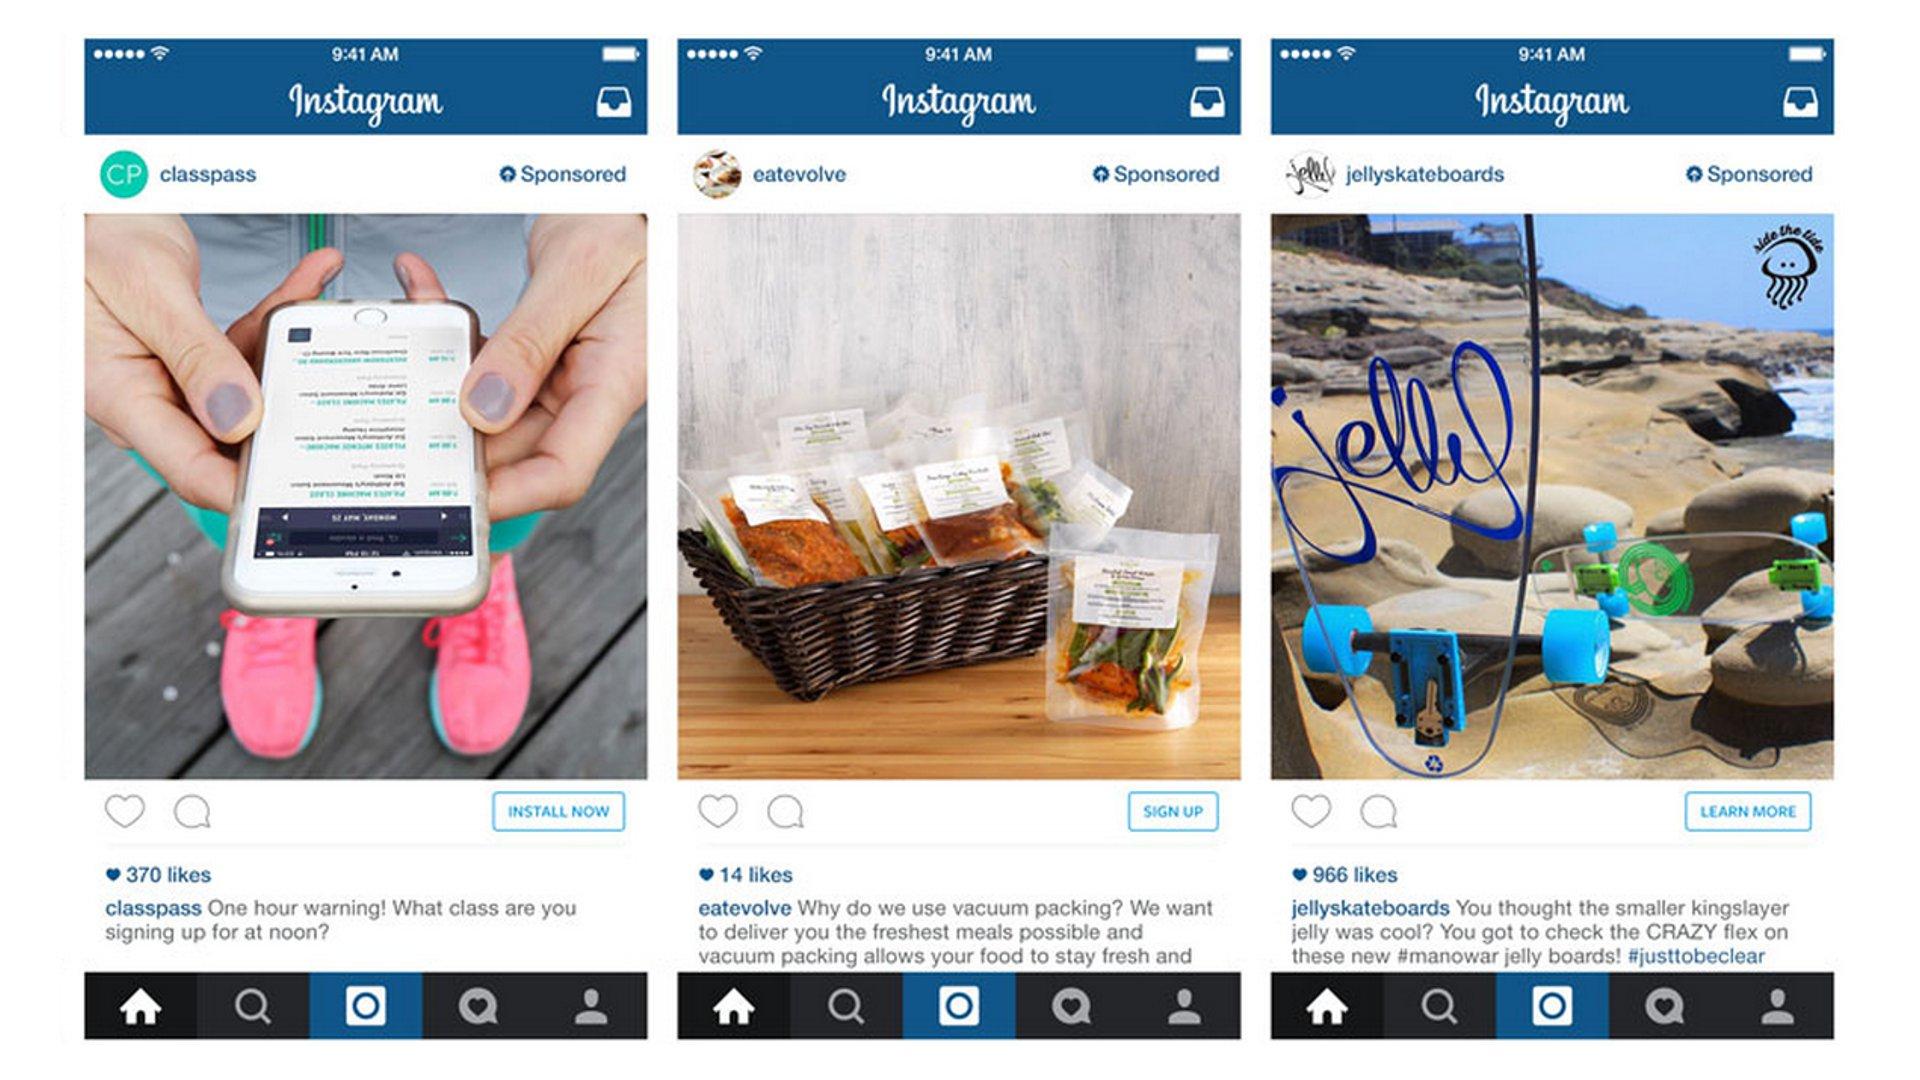 Instagram - Sponsored Ads